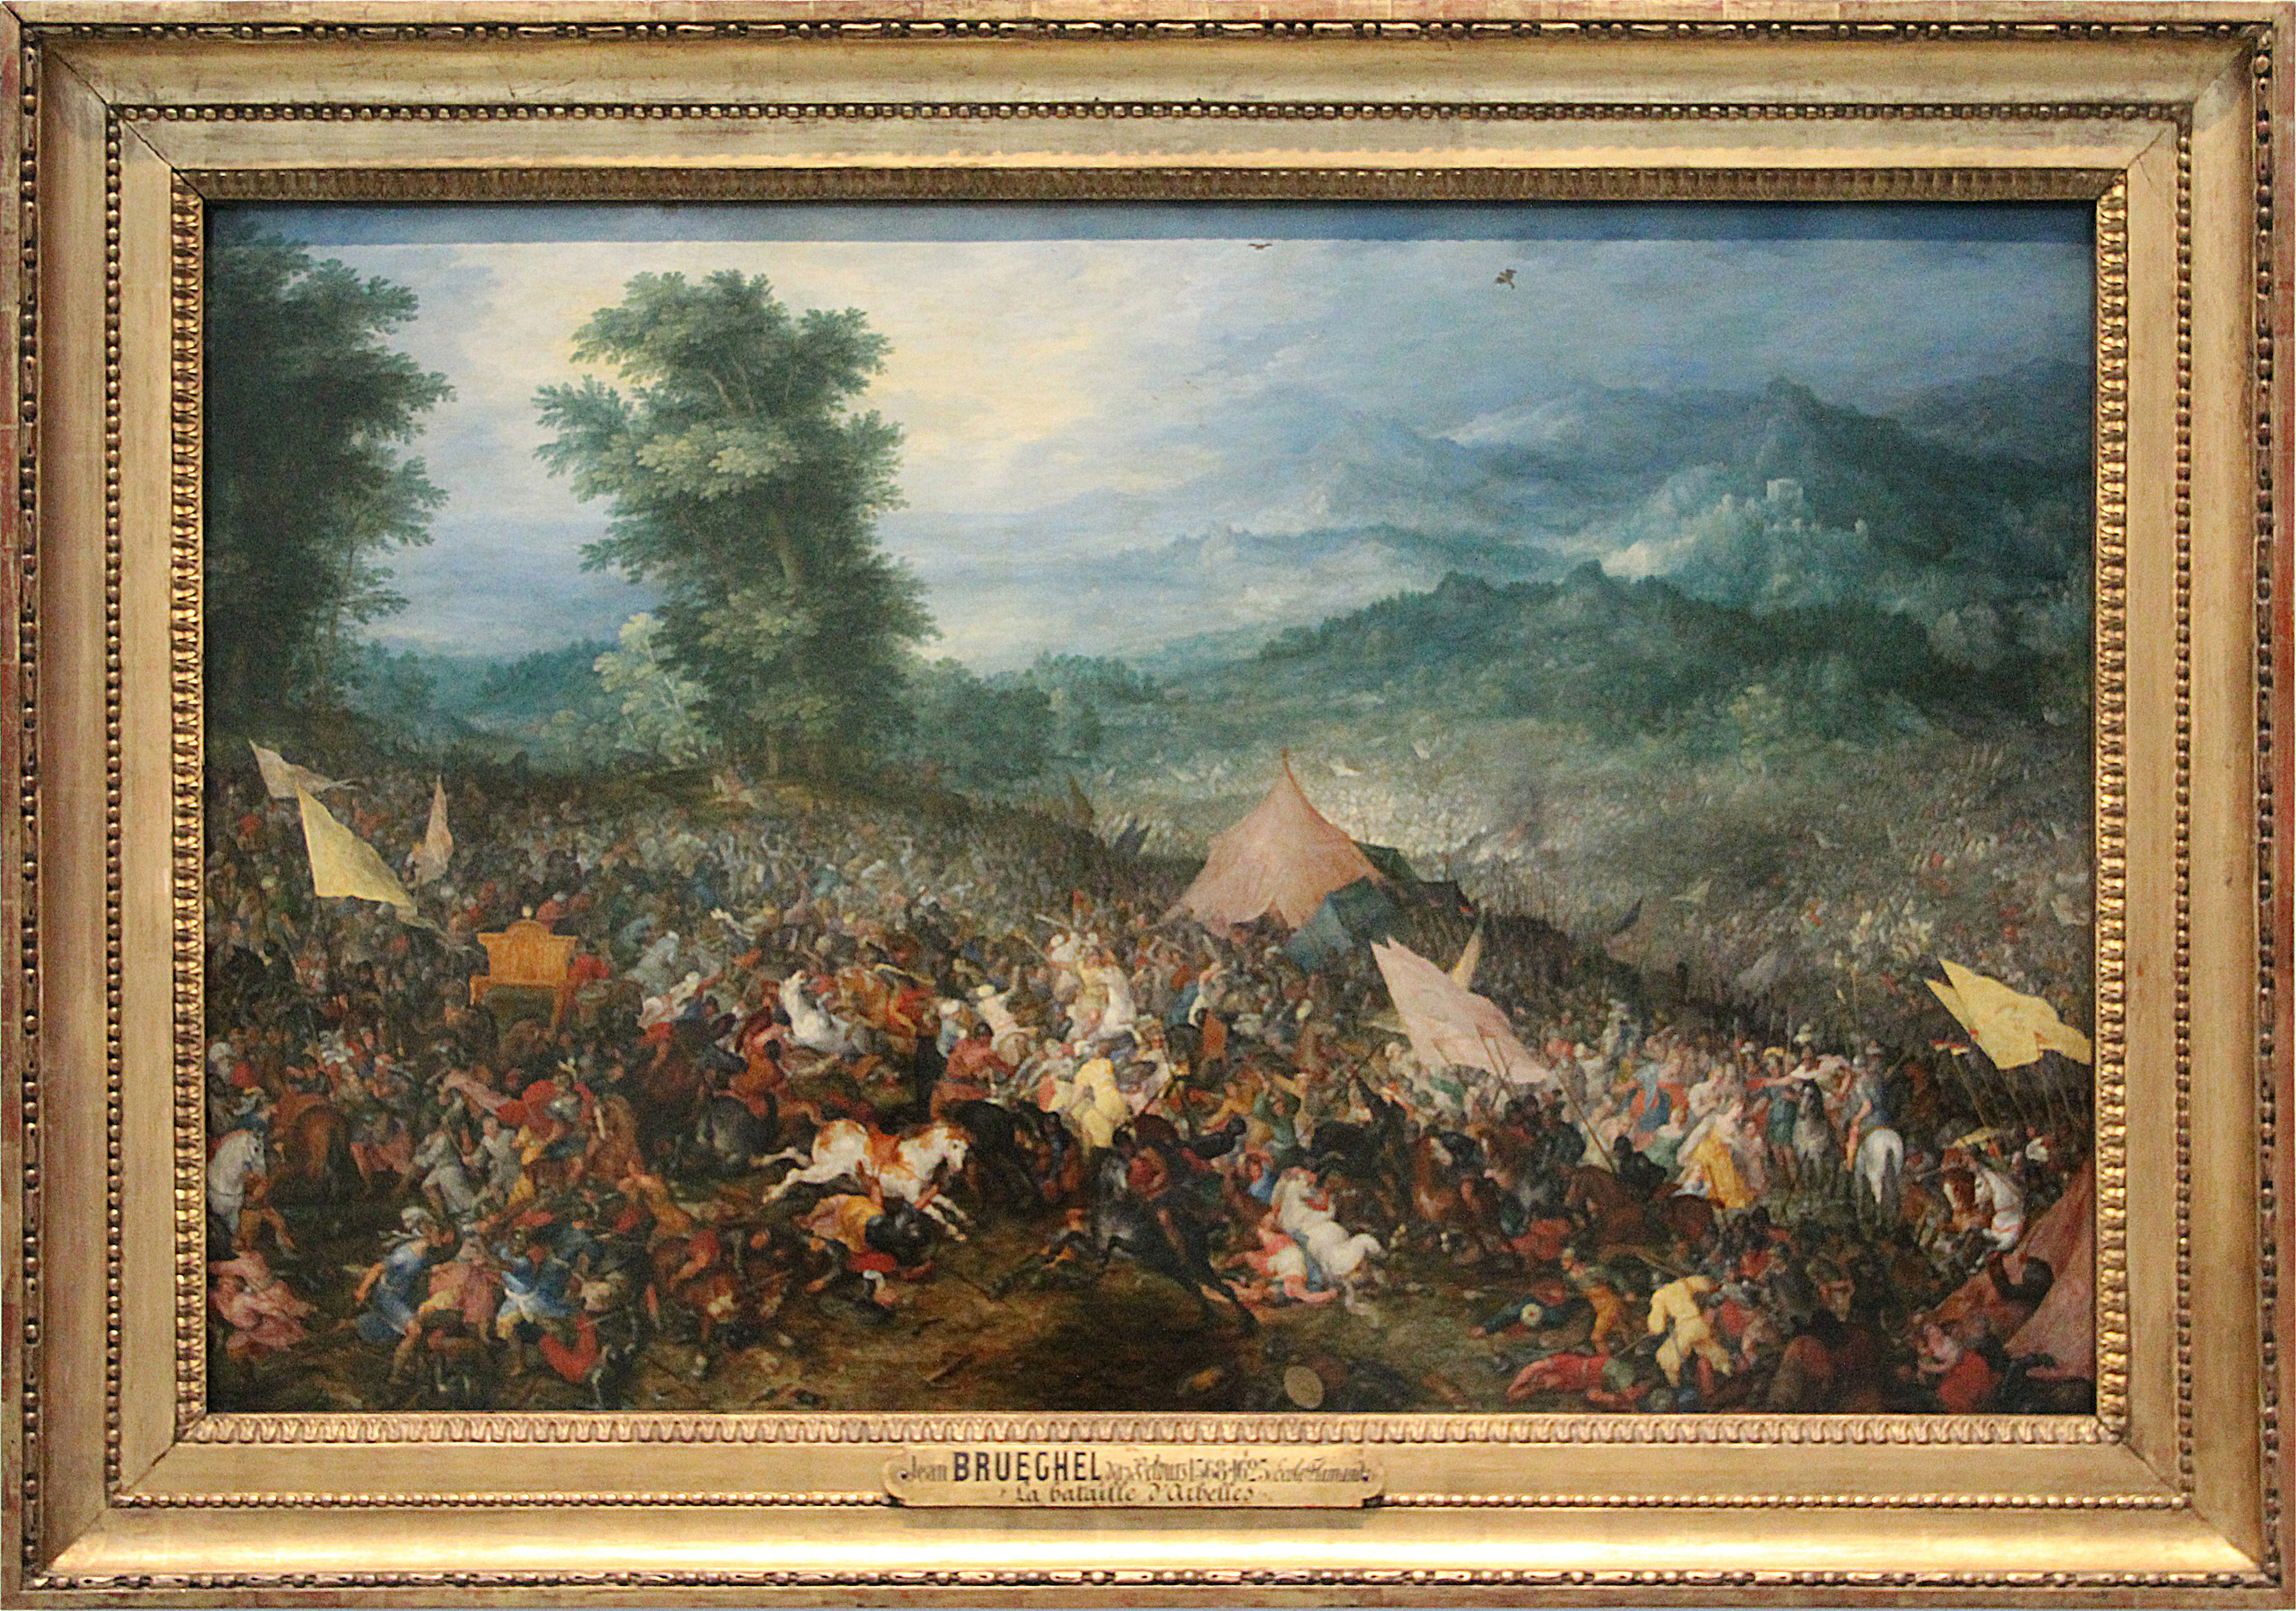 The Battle of Issus or Arbela, 1602, Jan Brueghel the Elder, Flemish school